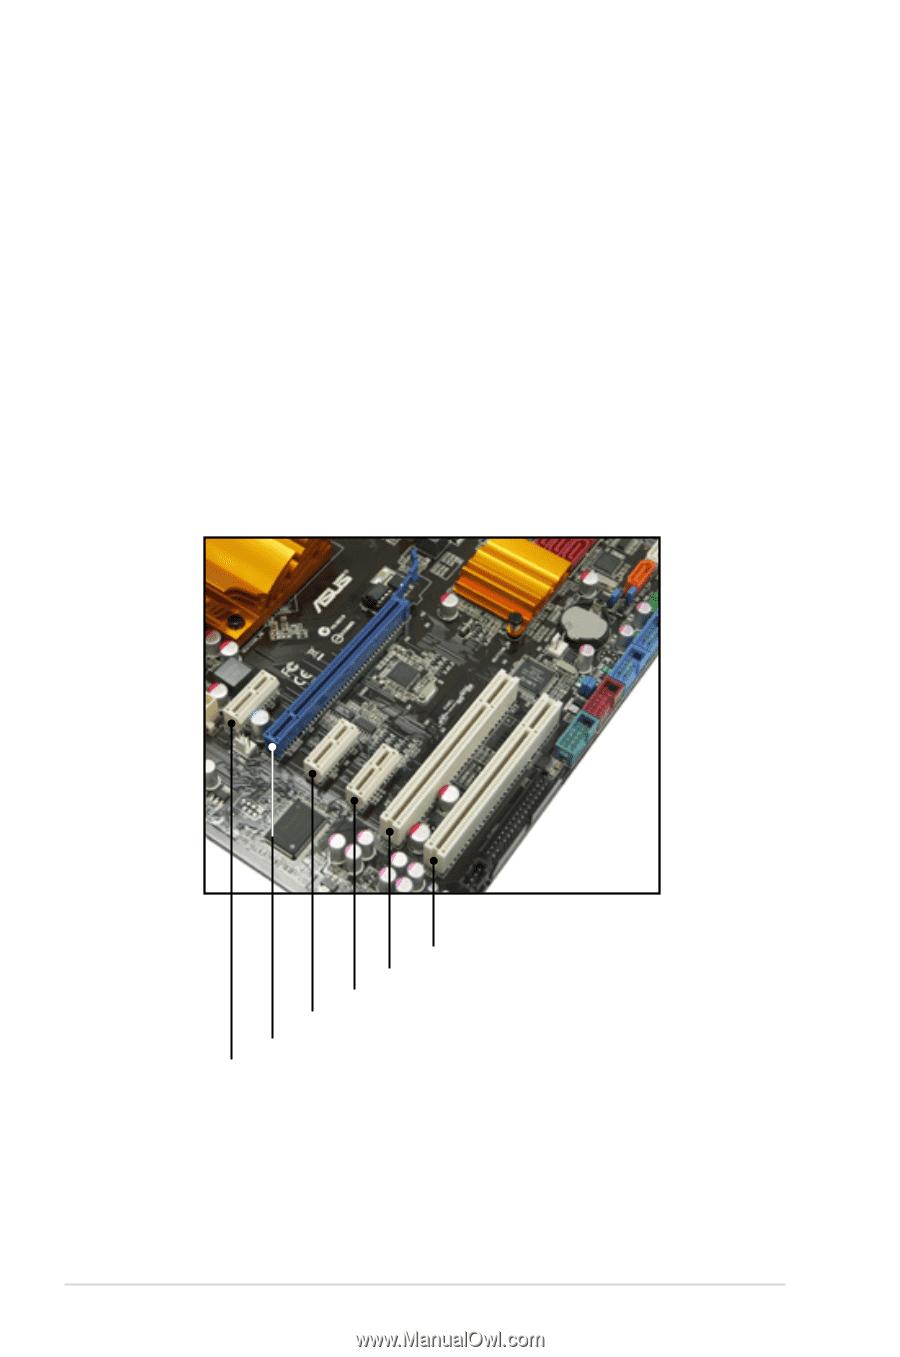 ASUS P5QC PC PROBEII DRIVER FOR WINDOWS MAC